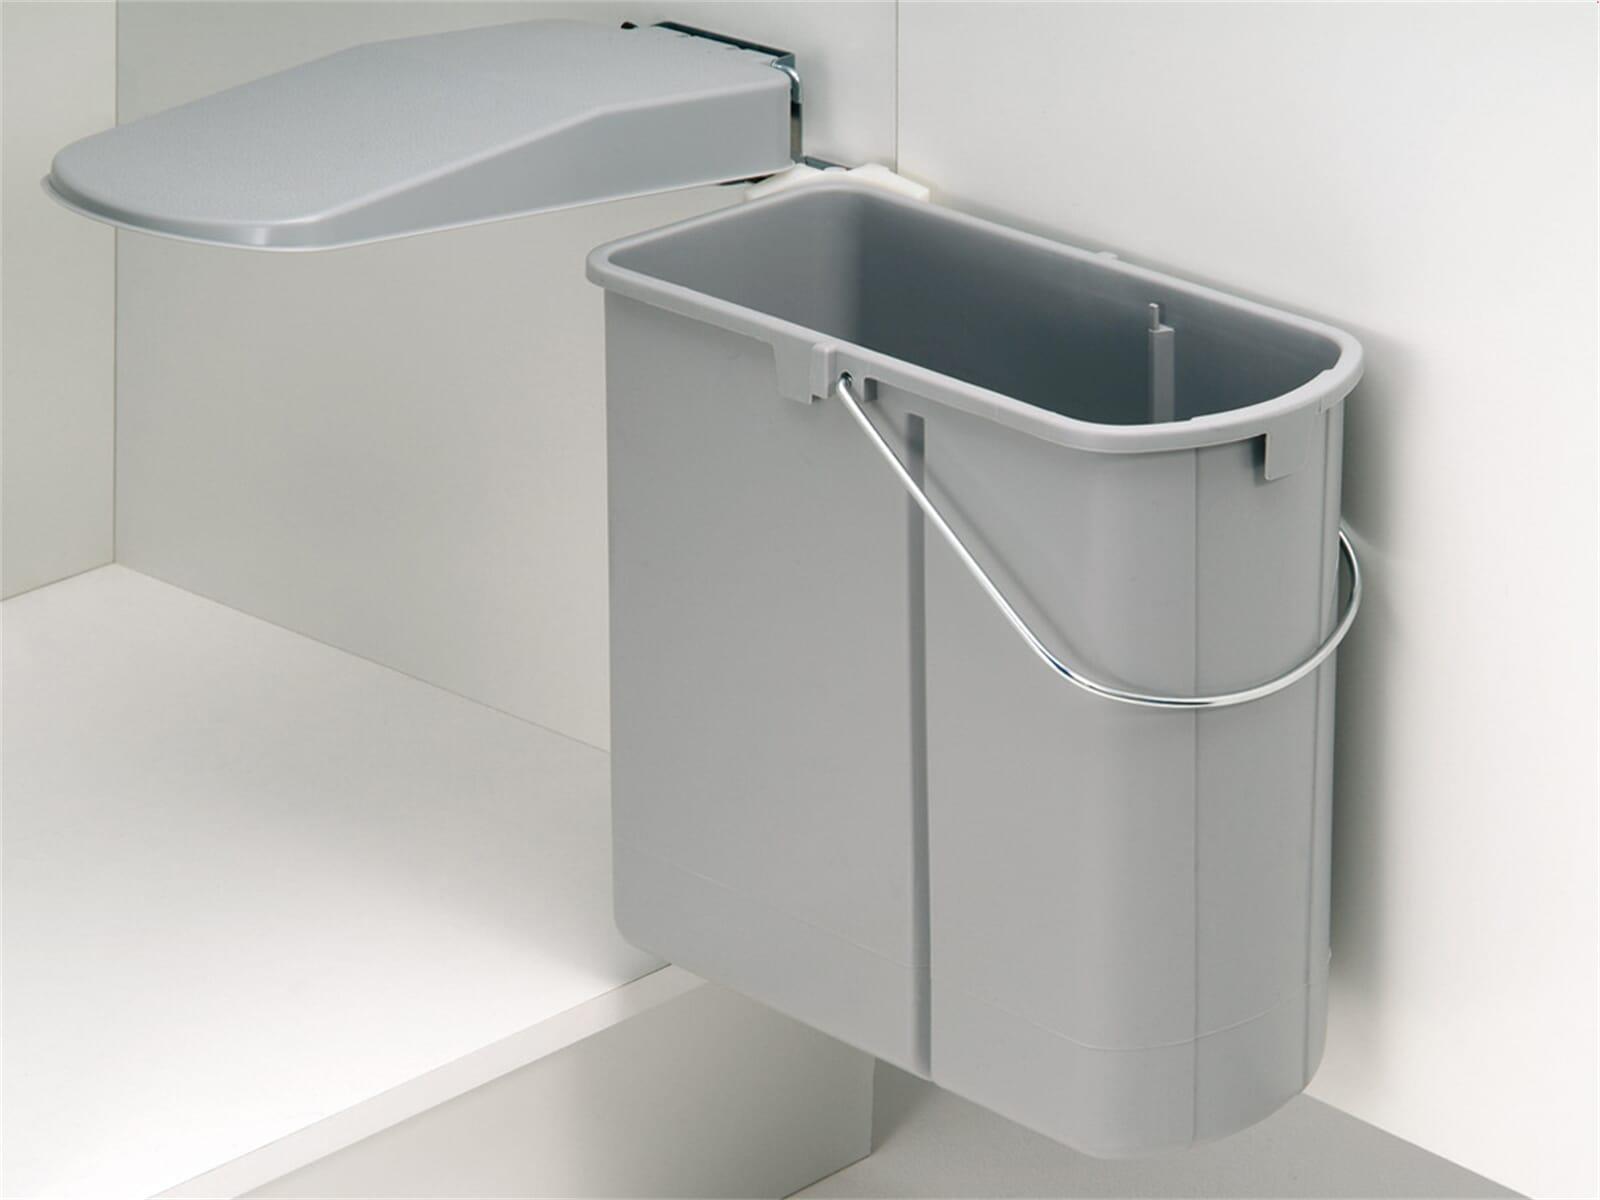 wesco 700411 85 einbau abfallsammler flach. Black Bedroom Furniture Sets. Home Design Ideas